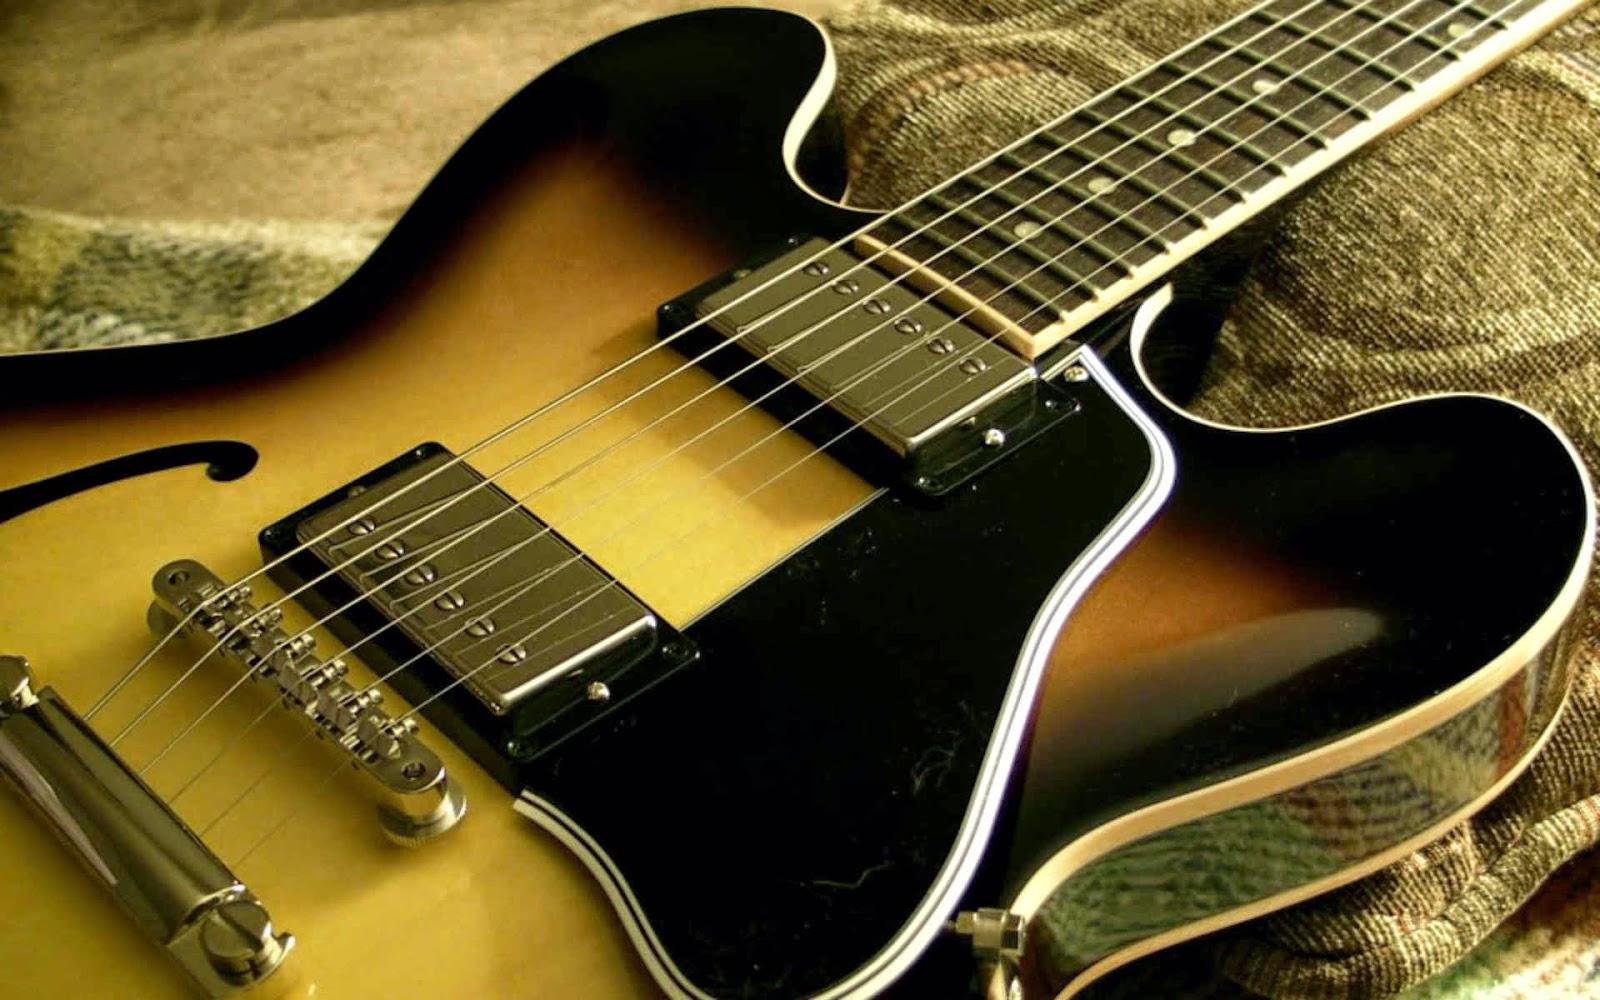 Hd wallpaper gitar - Gibson Acoustic Guitar Wallpaper Hd 1920x1200 Download Wallpaper For